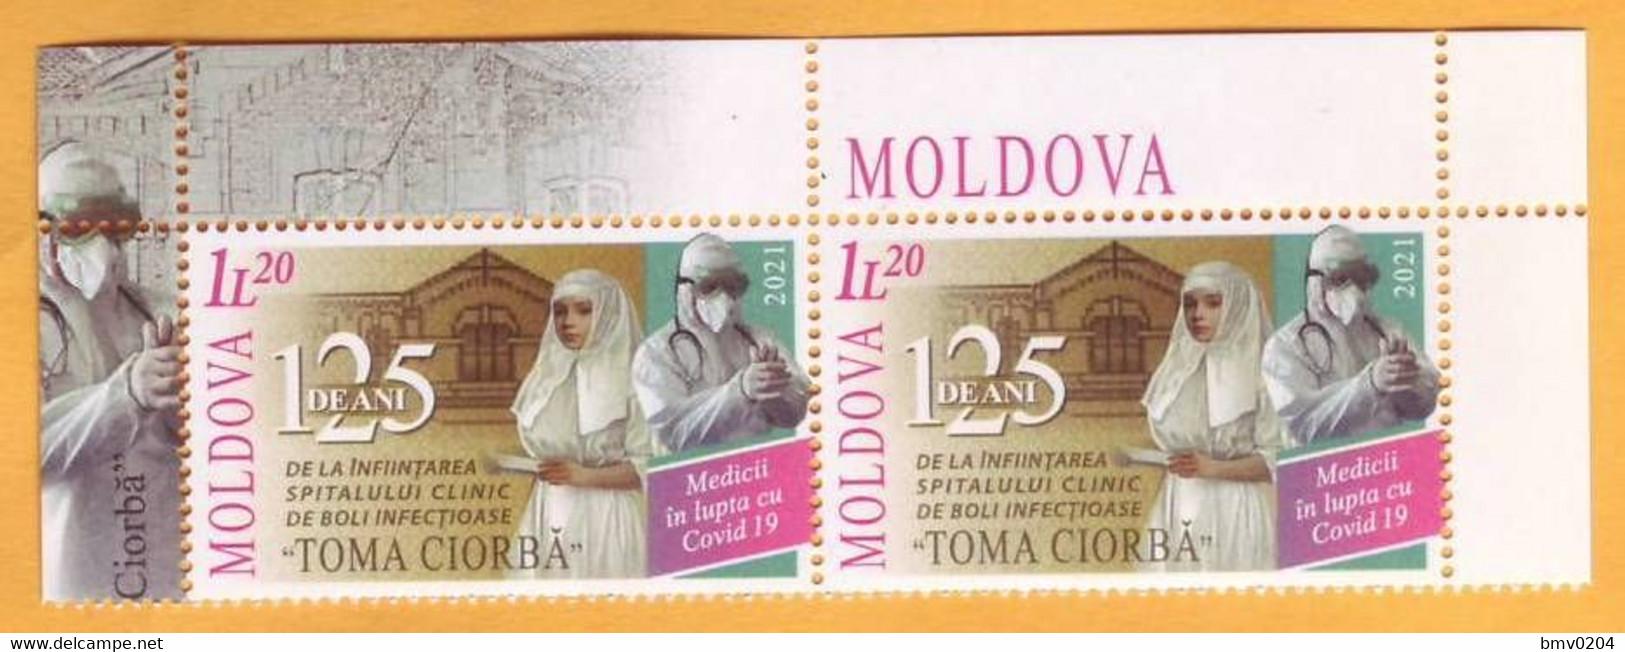 "2021 Moldova Moldavie Moldau  Covid-19, Medicine, Infection, Ambulance, 125, Physician Hospital ""T.Ciorba"" 2v - Secourisme"